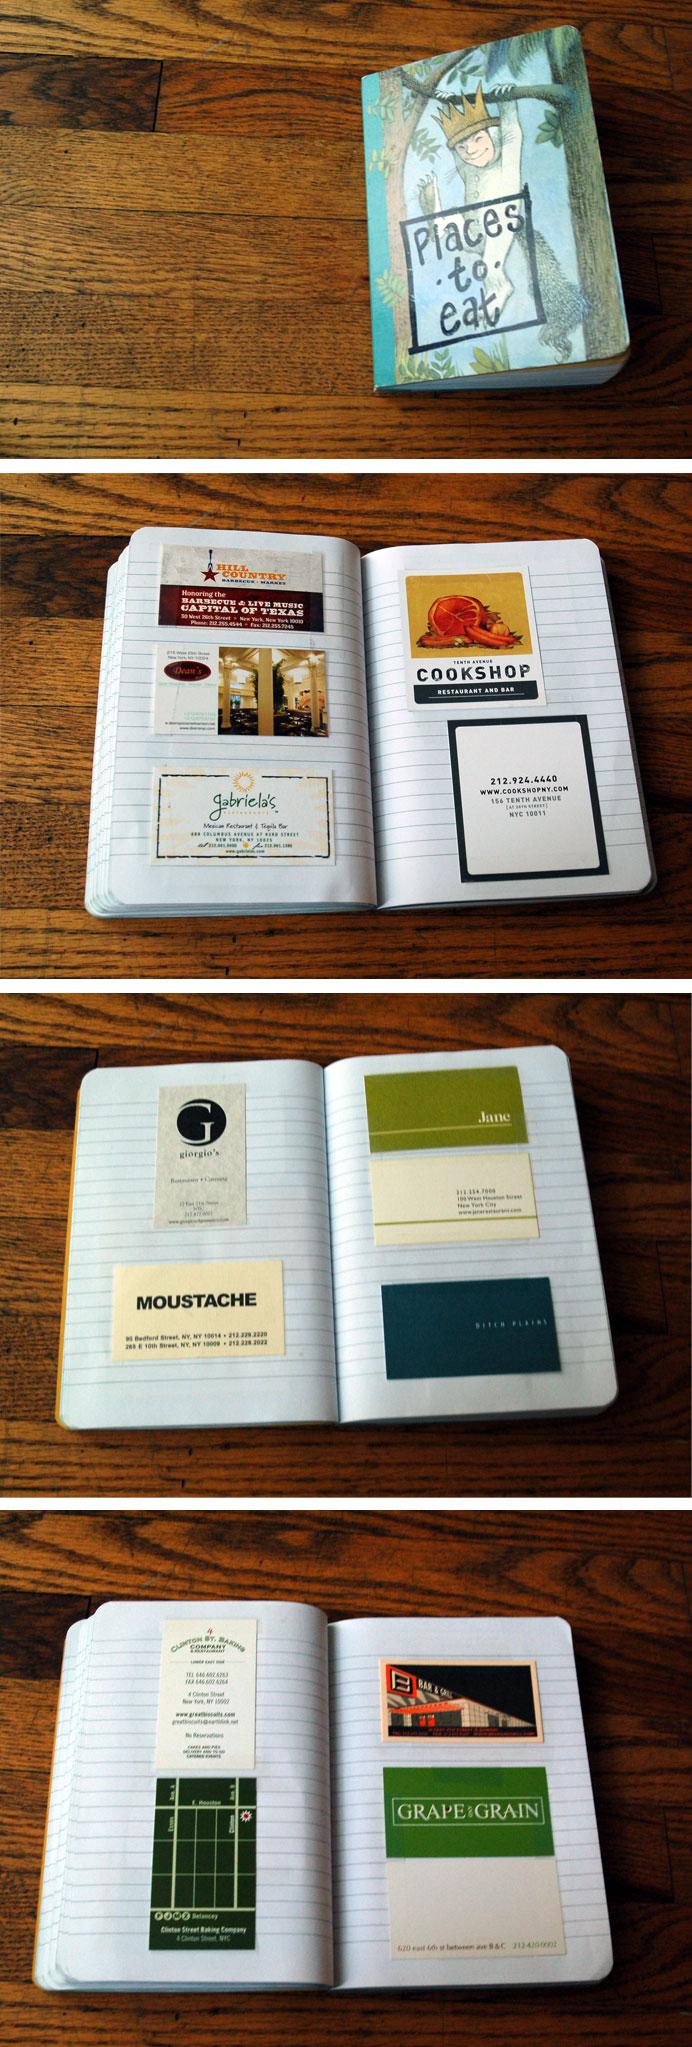 restaurant_book1.jpg